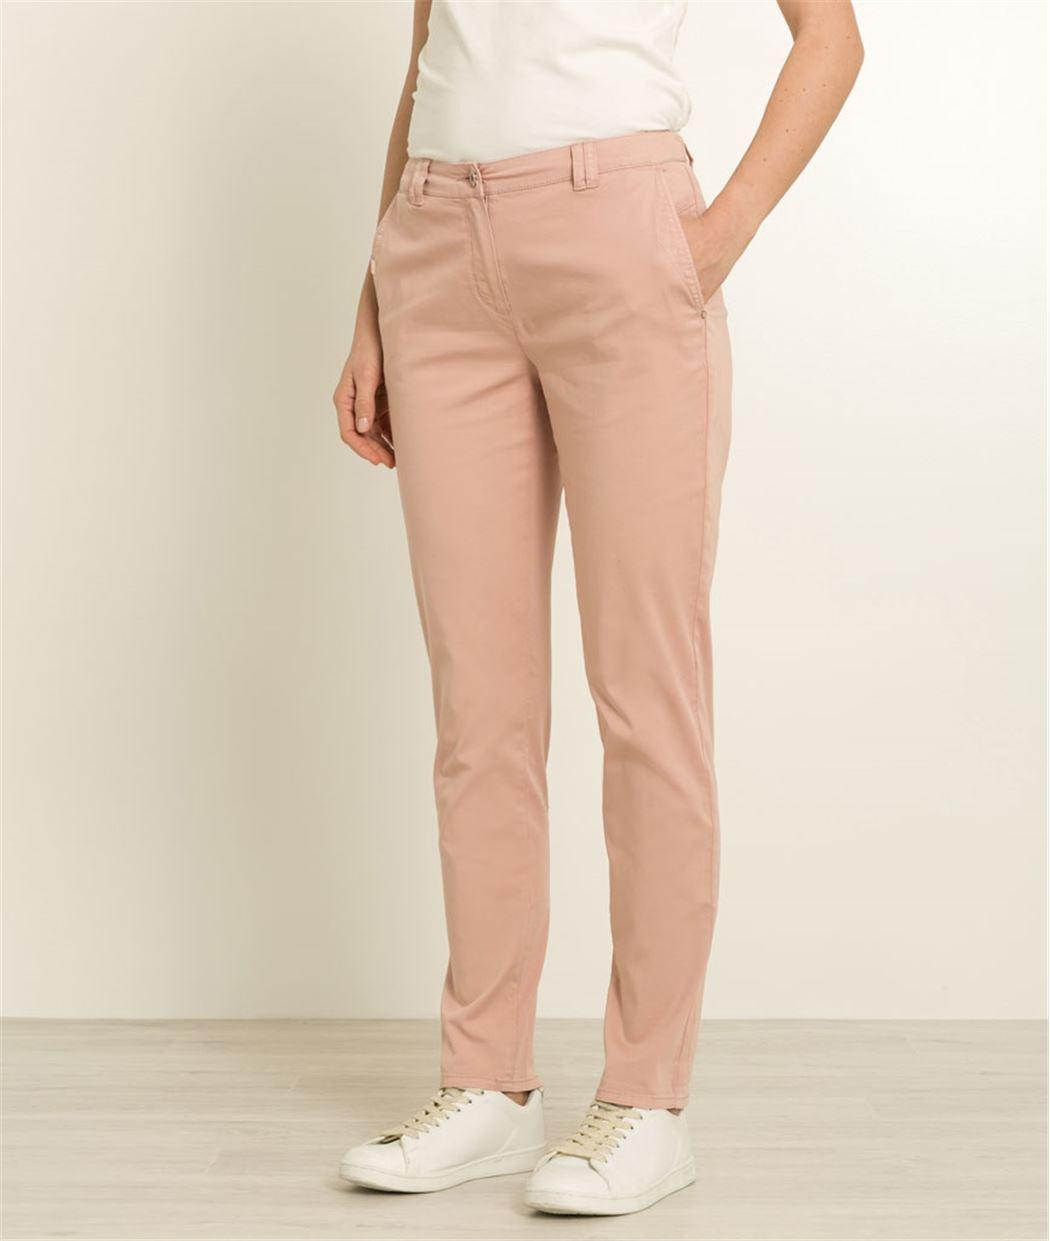 Pantalon femme chino PETALE